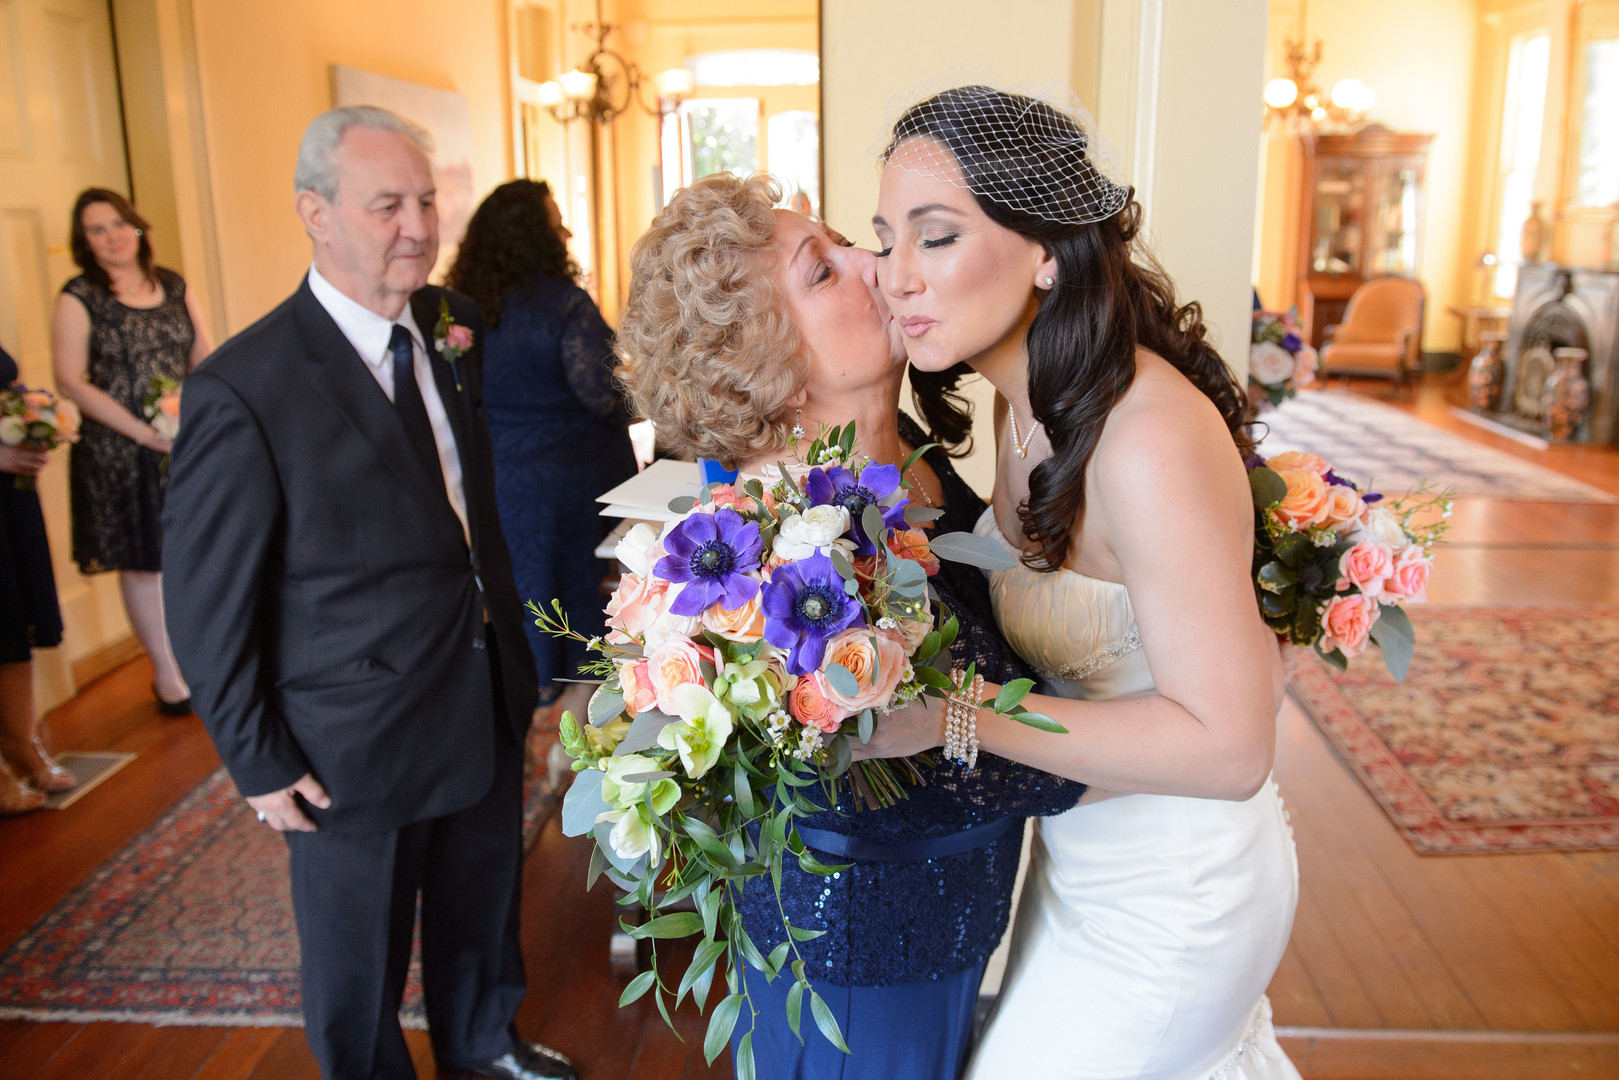 Kristina & Garrett Bride's Parents_wedding_0420.jpg